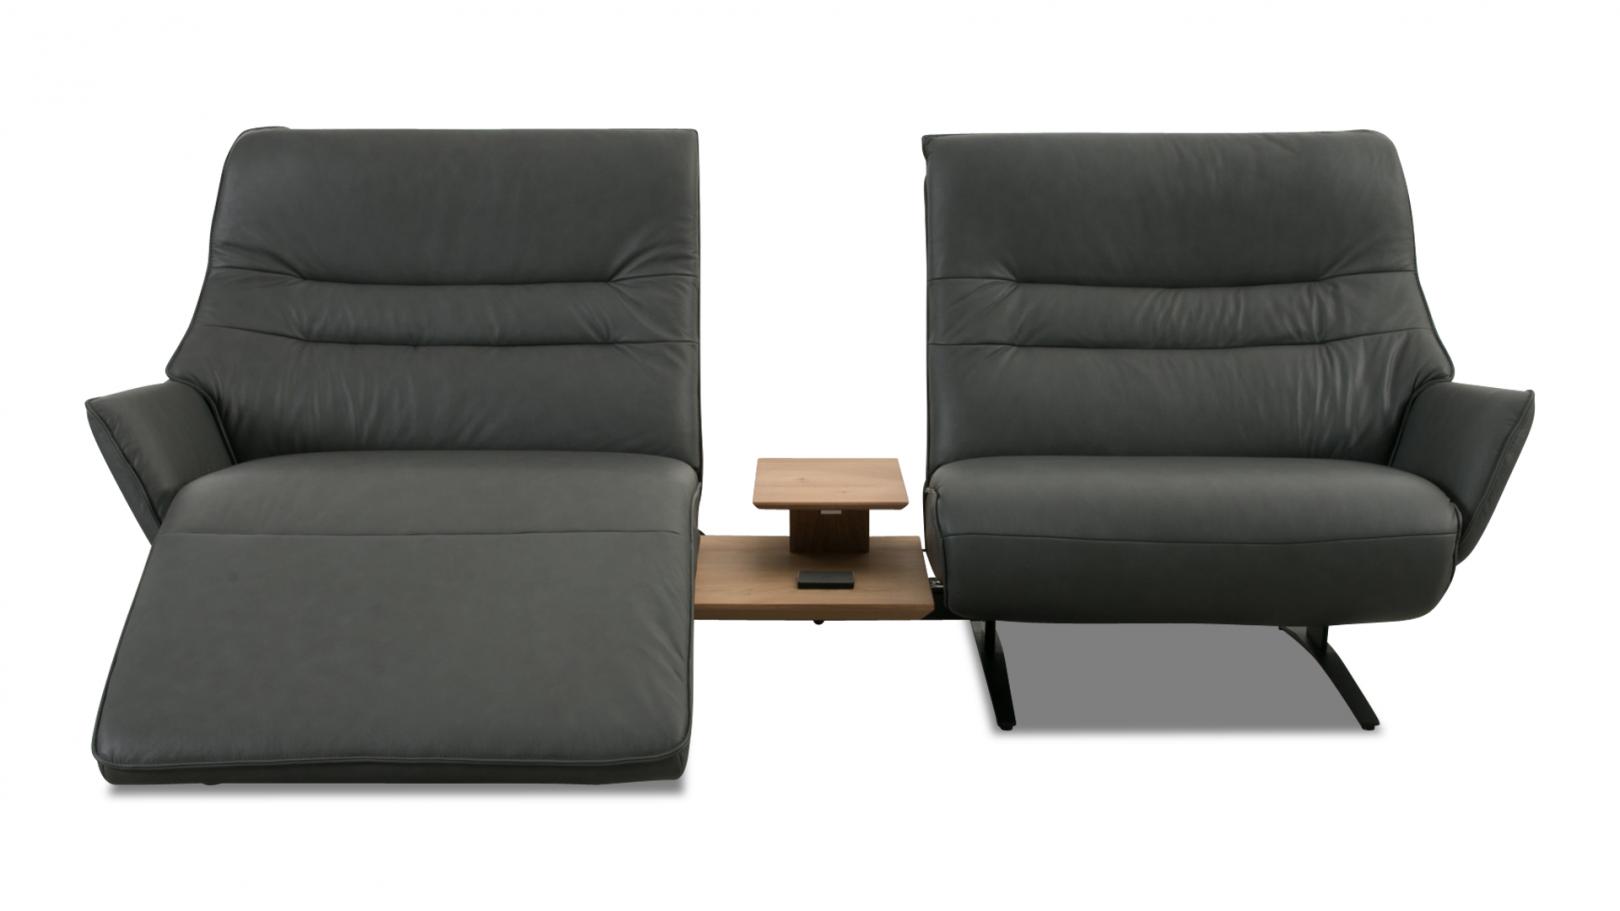 Himolla Sofa Lounger 4905 In Leder Longlife Sofa Konfigurierbar